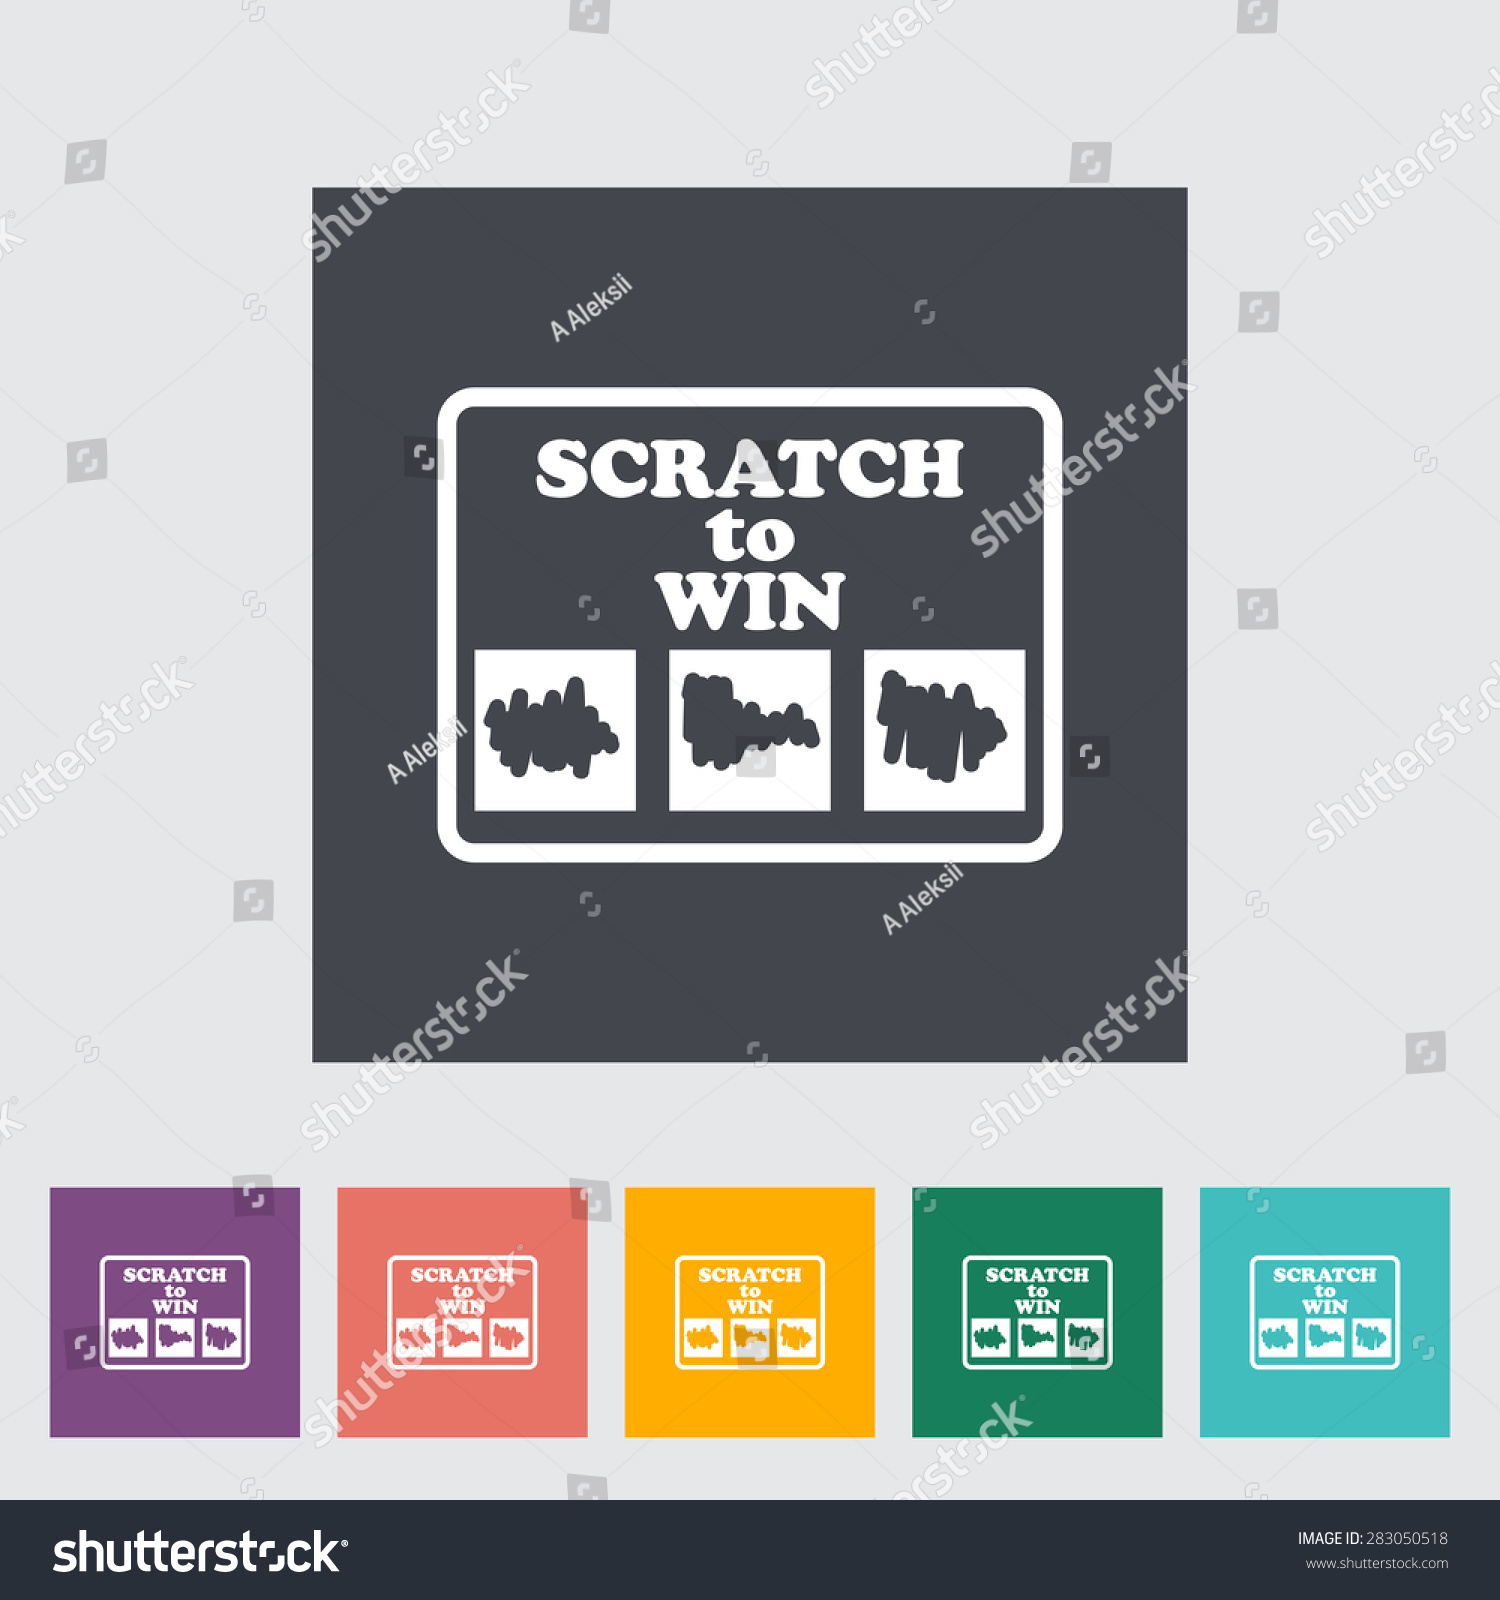 Scratch Card Symbols